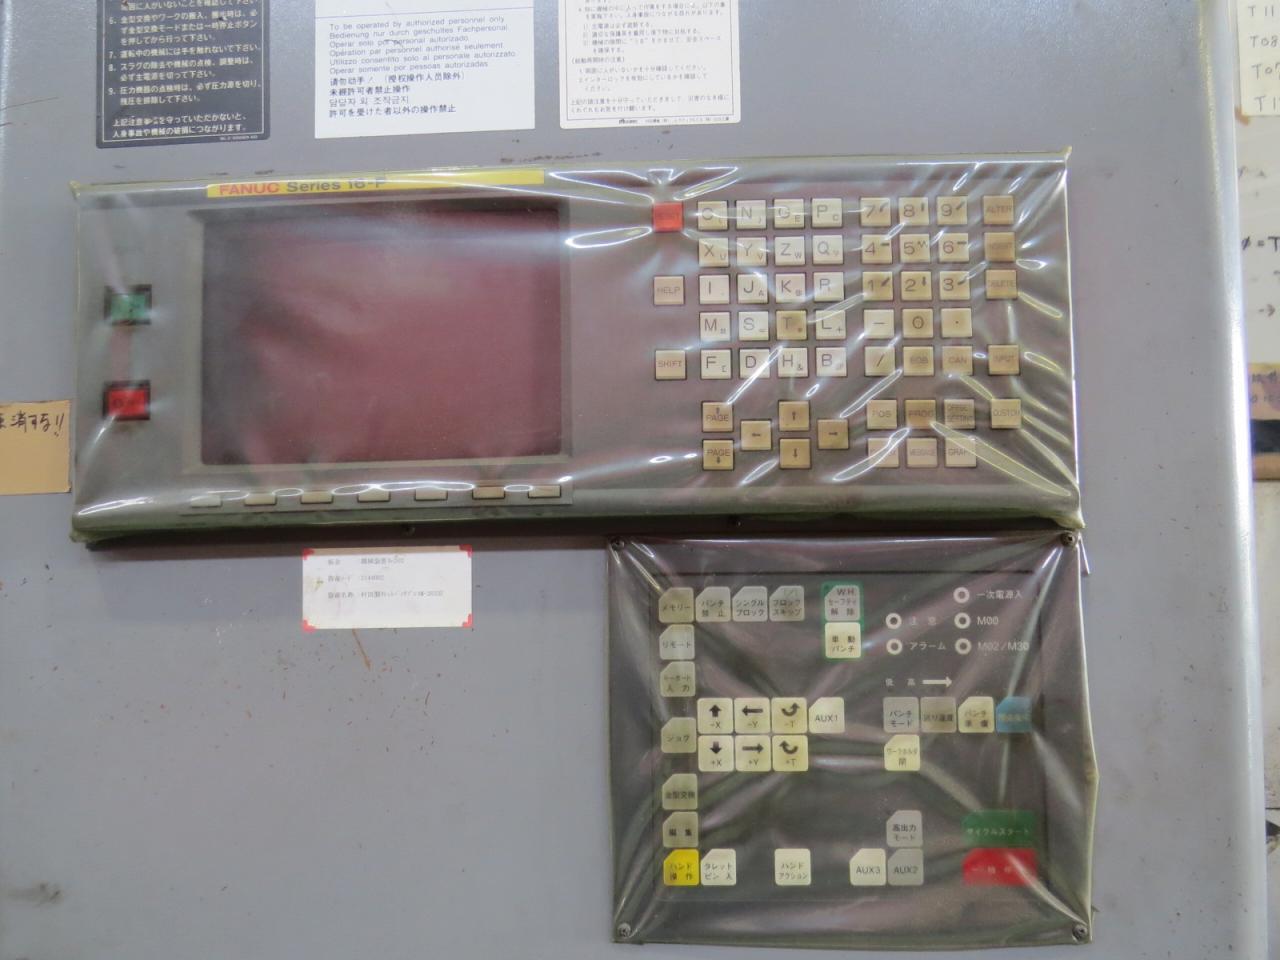 MOTORUM-2033のNC操作盤アップ